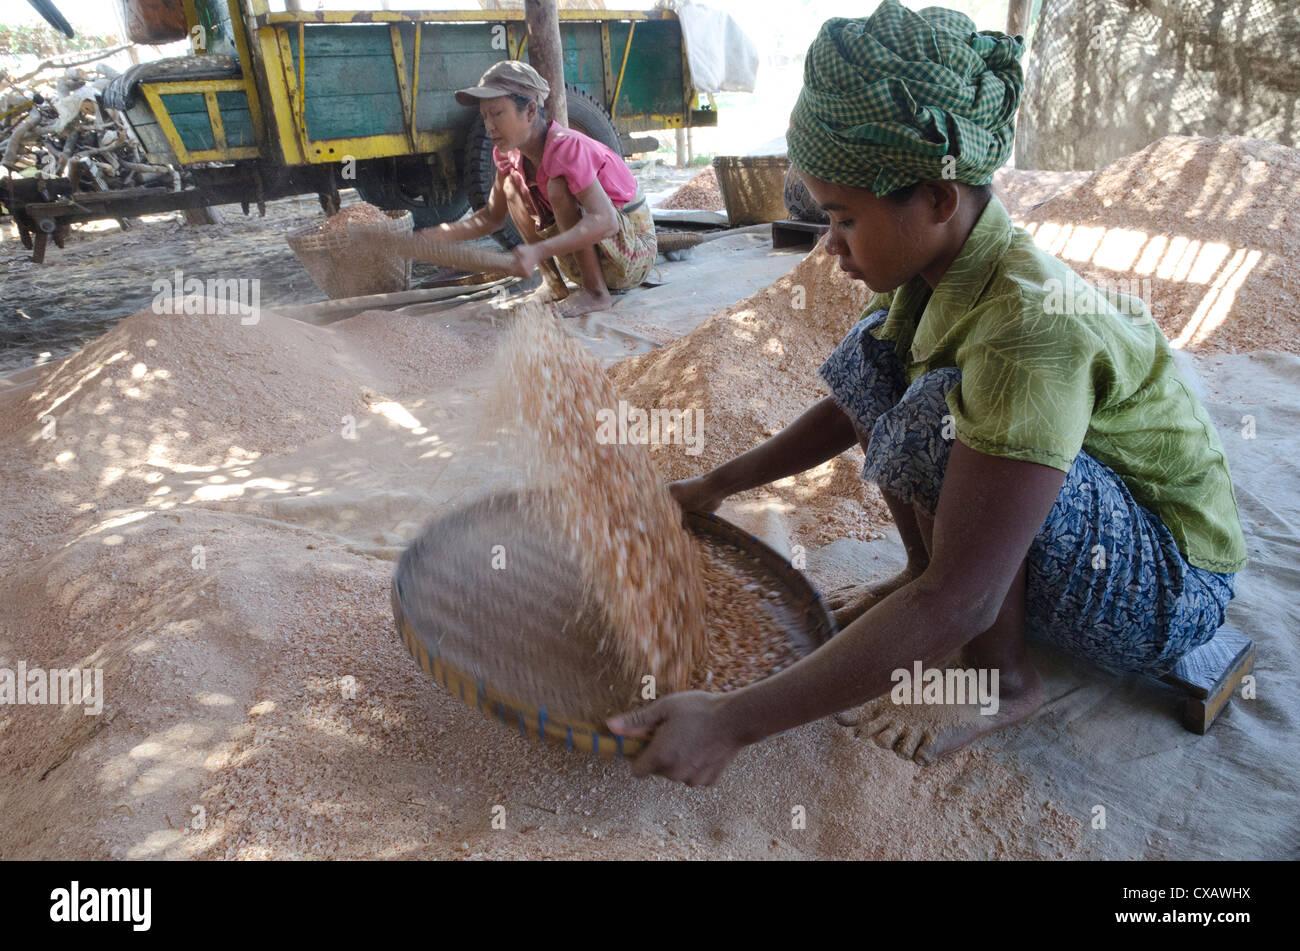 Production of shrimp powder in a fish farm, Irrawaddy Delta, Myanmar (Burma), Asia - Stock Image